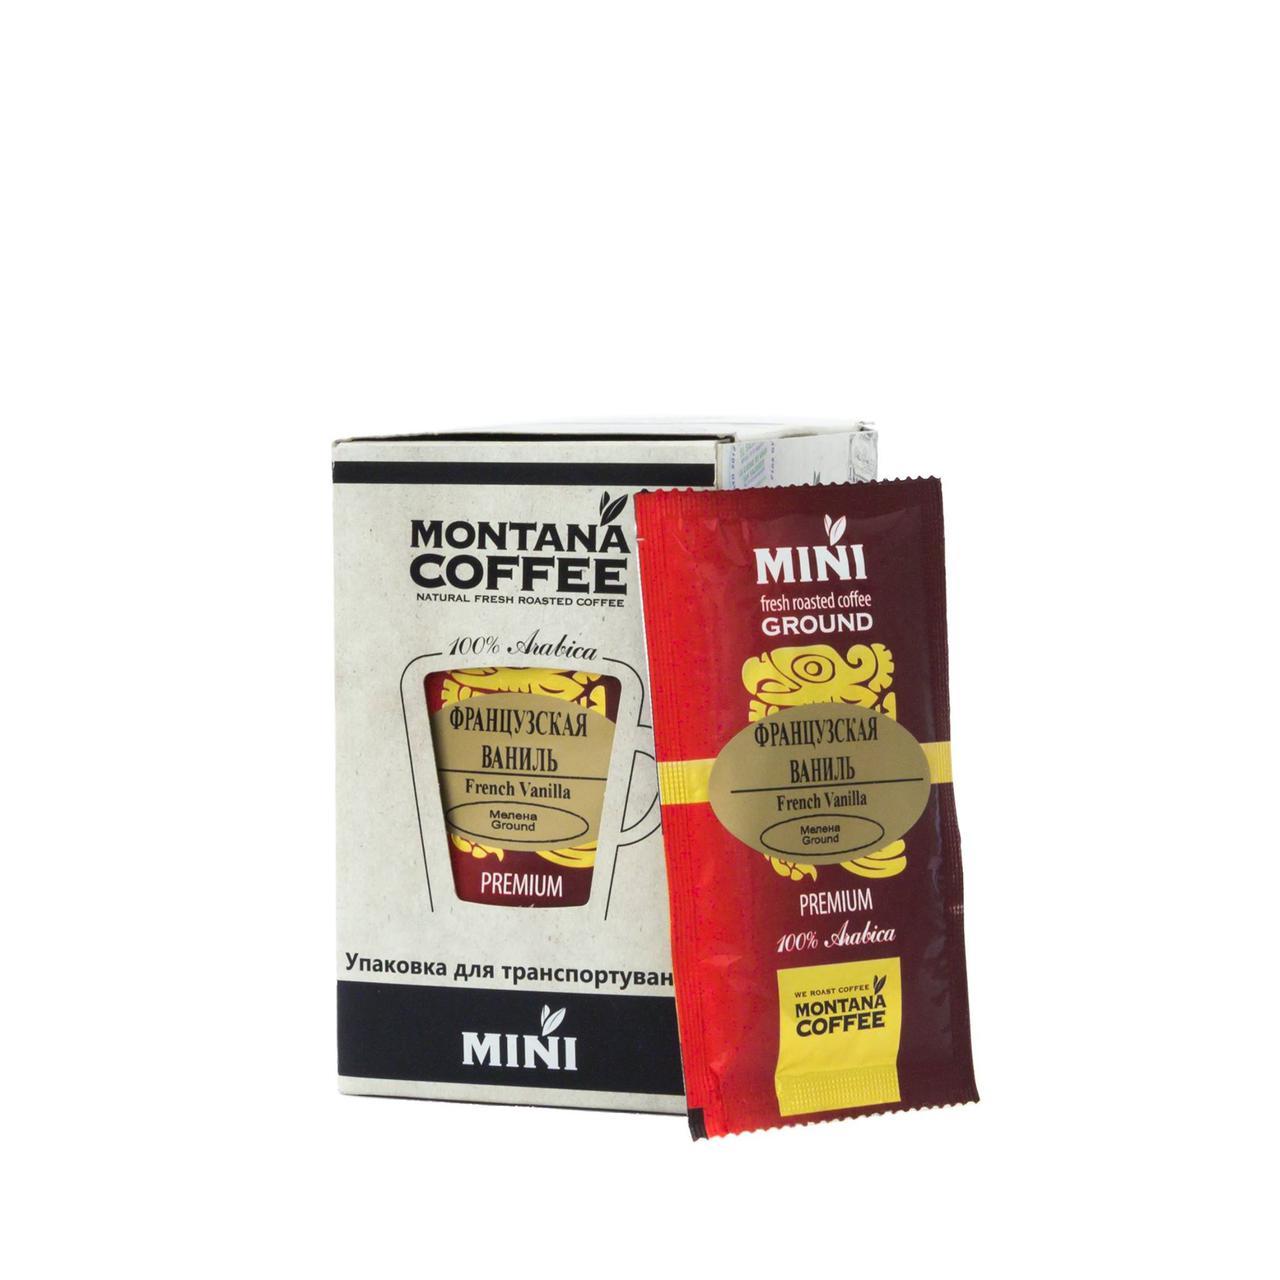 Французская ваниль Montana coffee MINI 20 шт